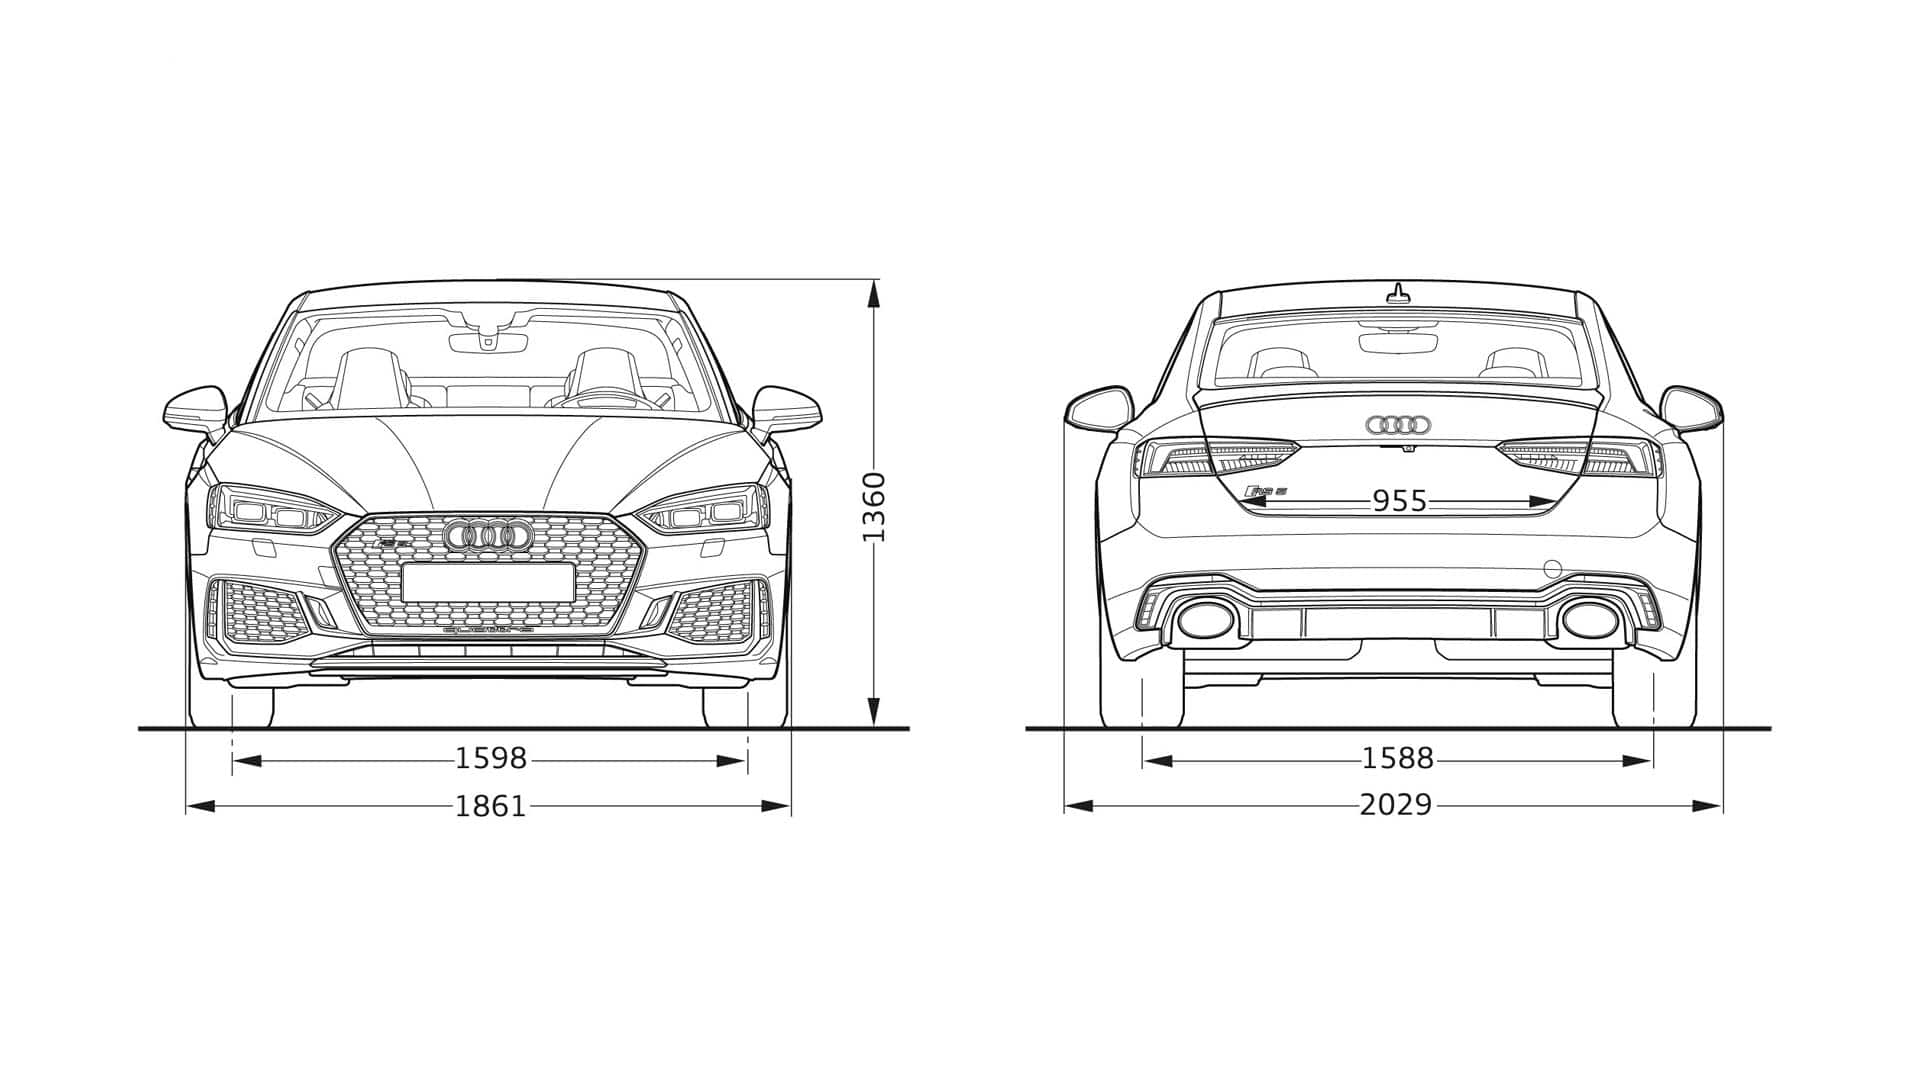 J519 Audi A3 Wiring Diagram